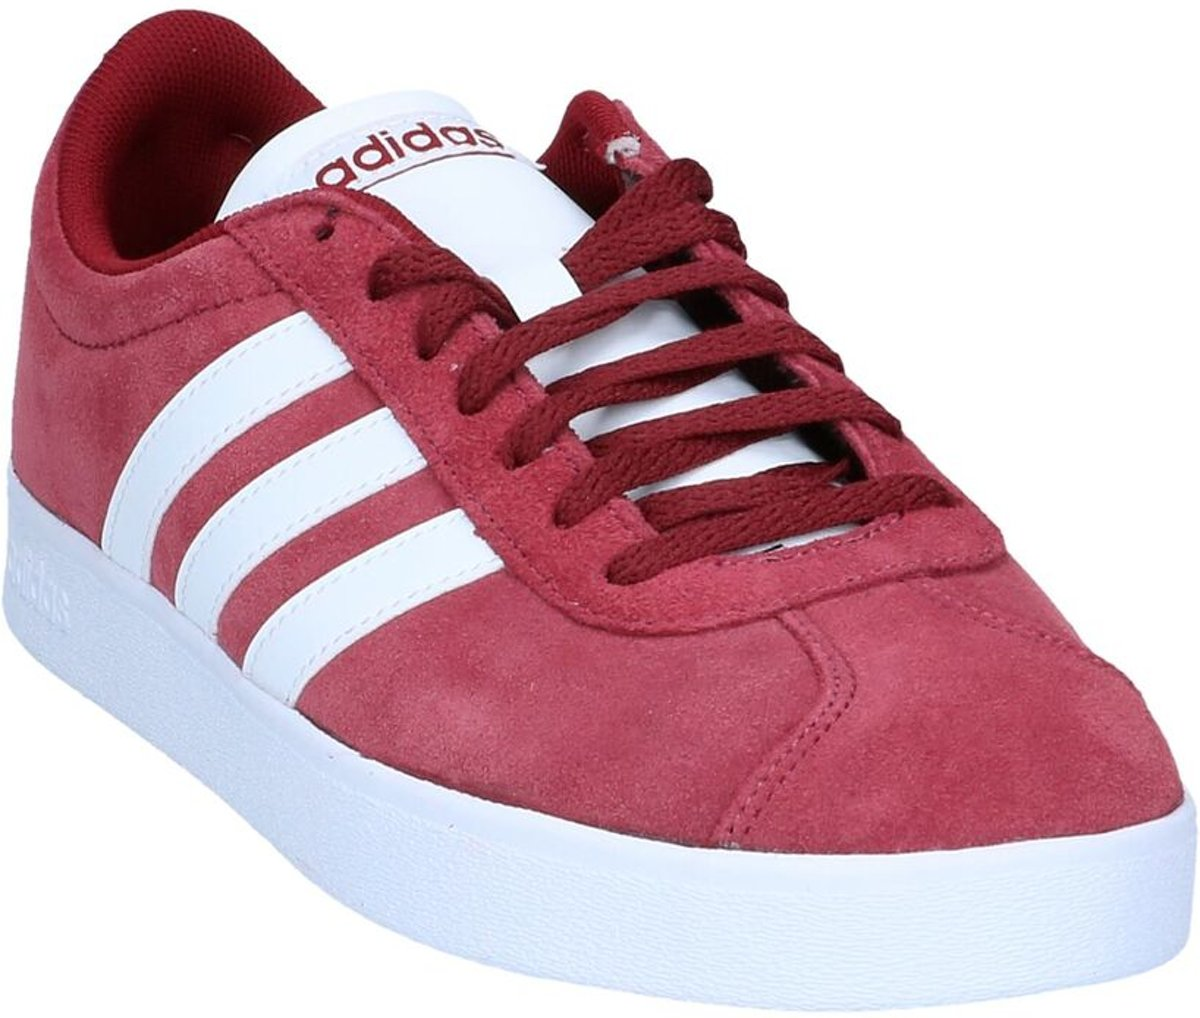 adidas Grand Court Heren Sneakers Ftwr WhiteCore Black Maat 40.5